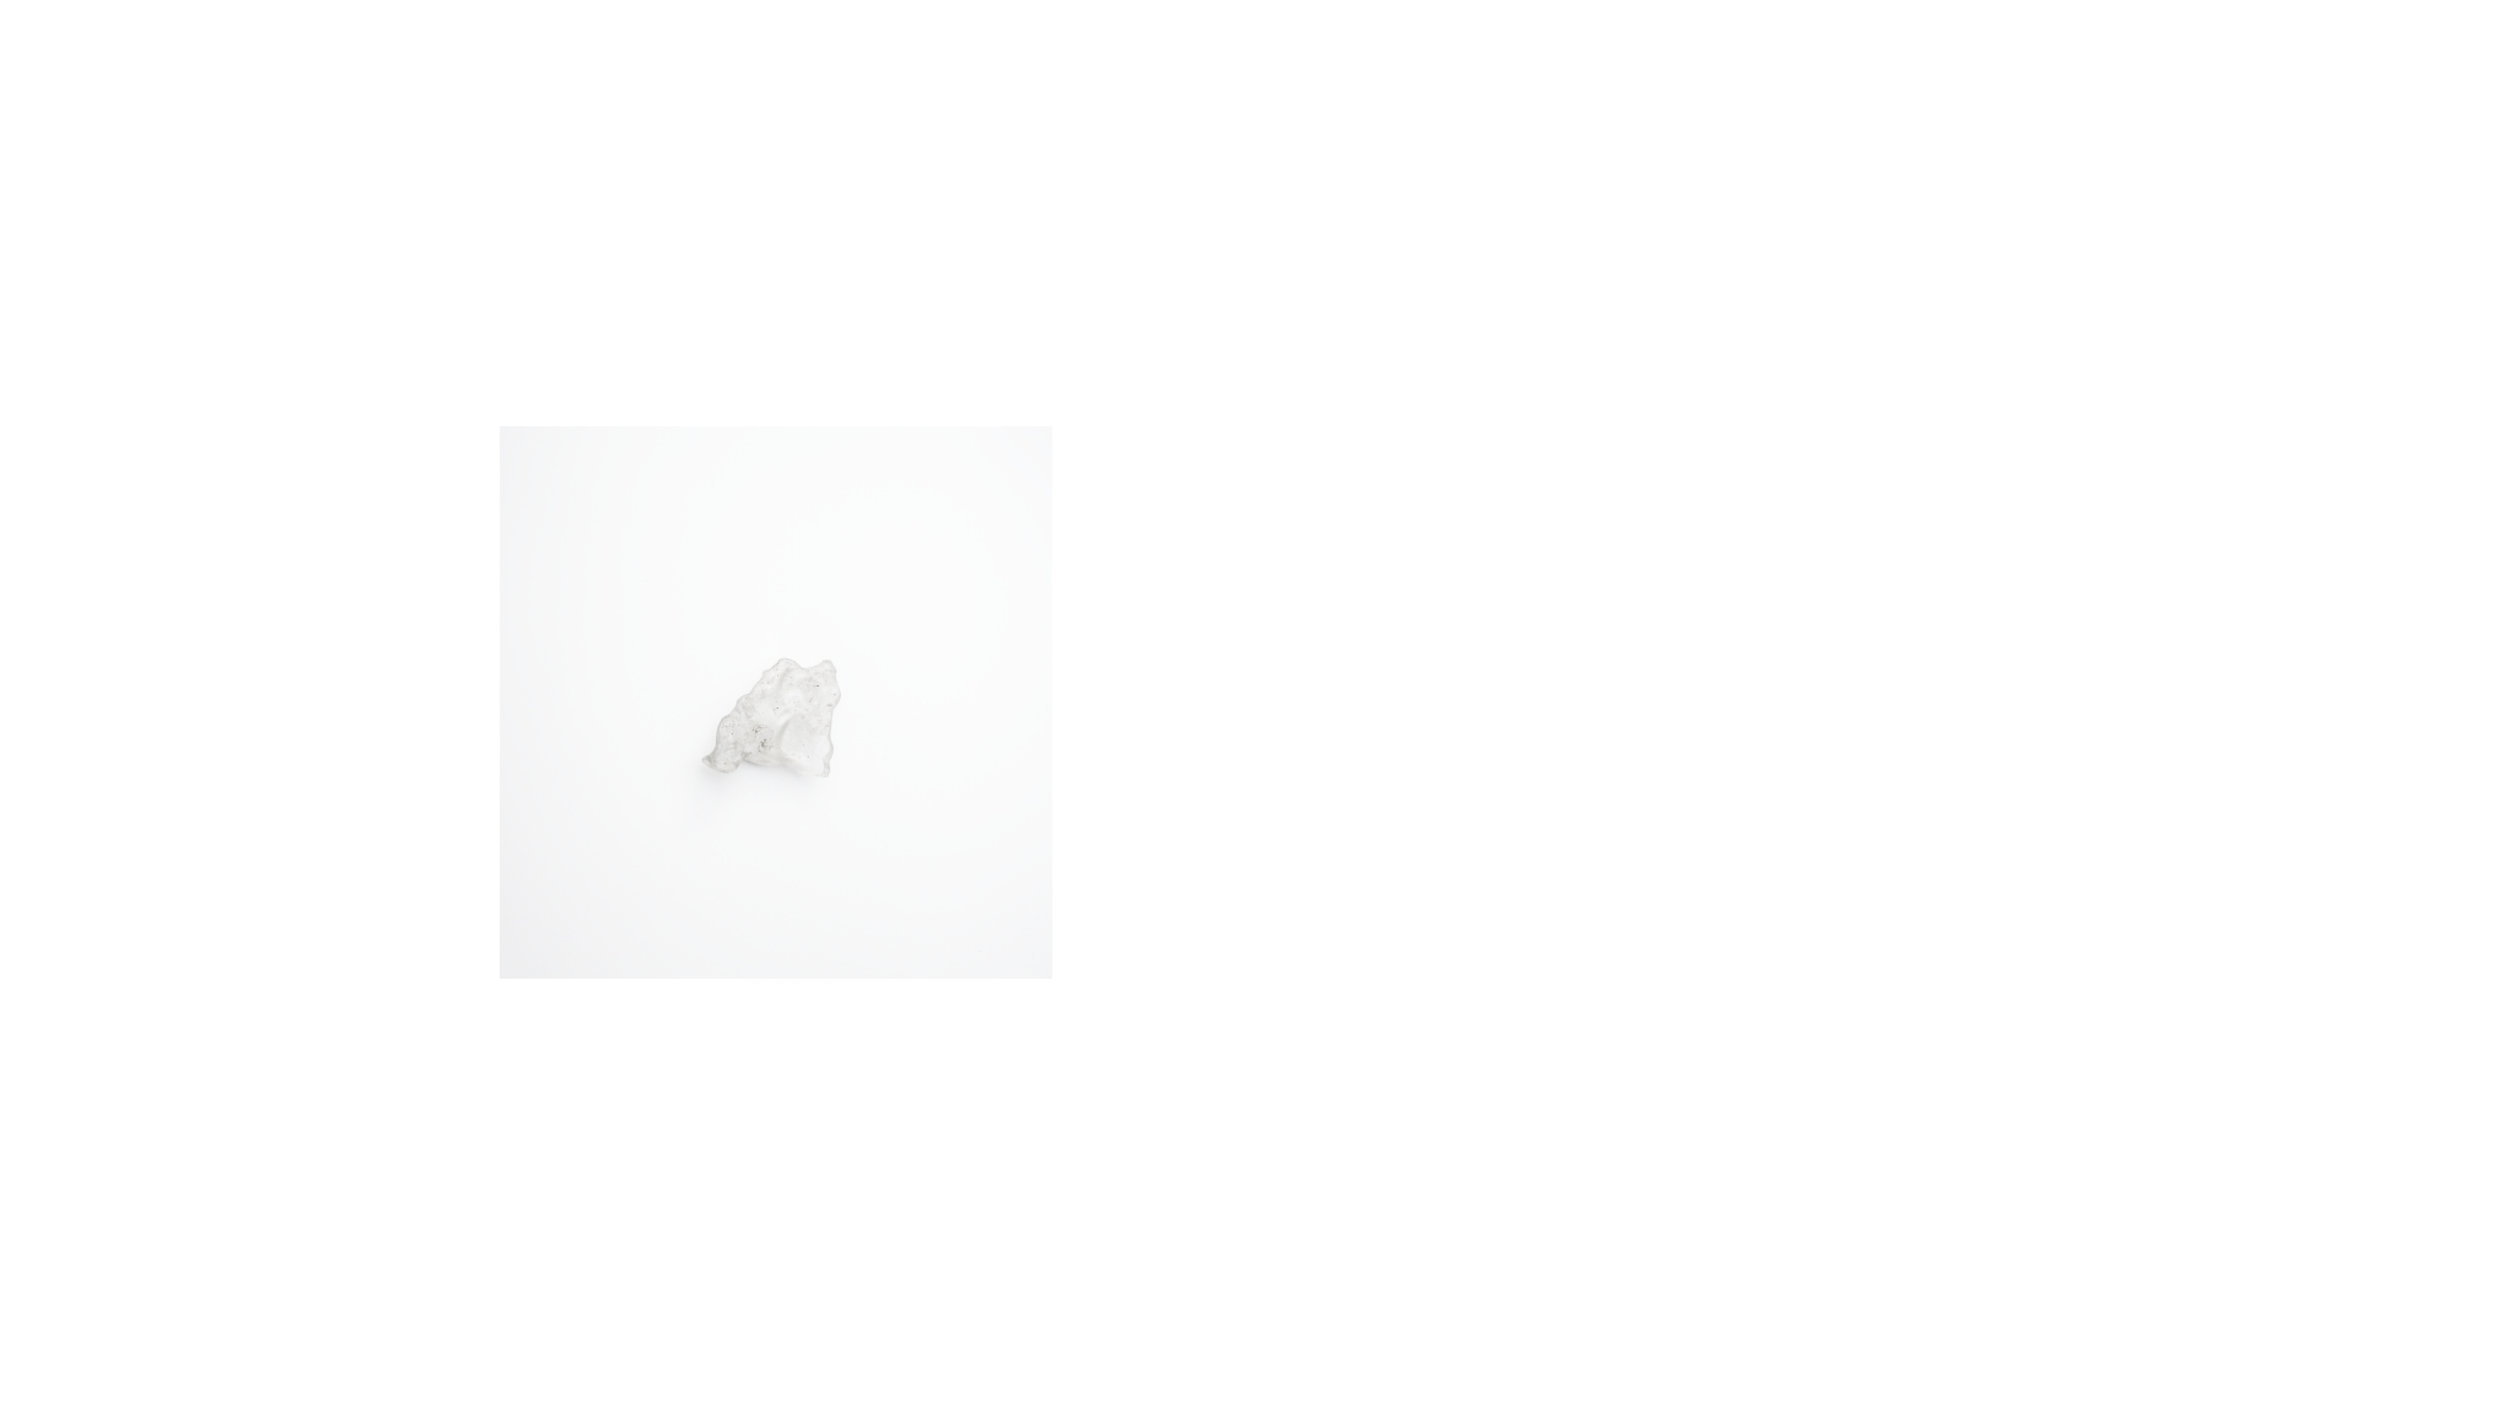 Untitled-1015.jpg